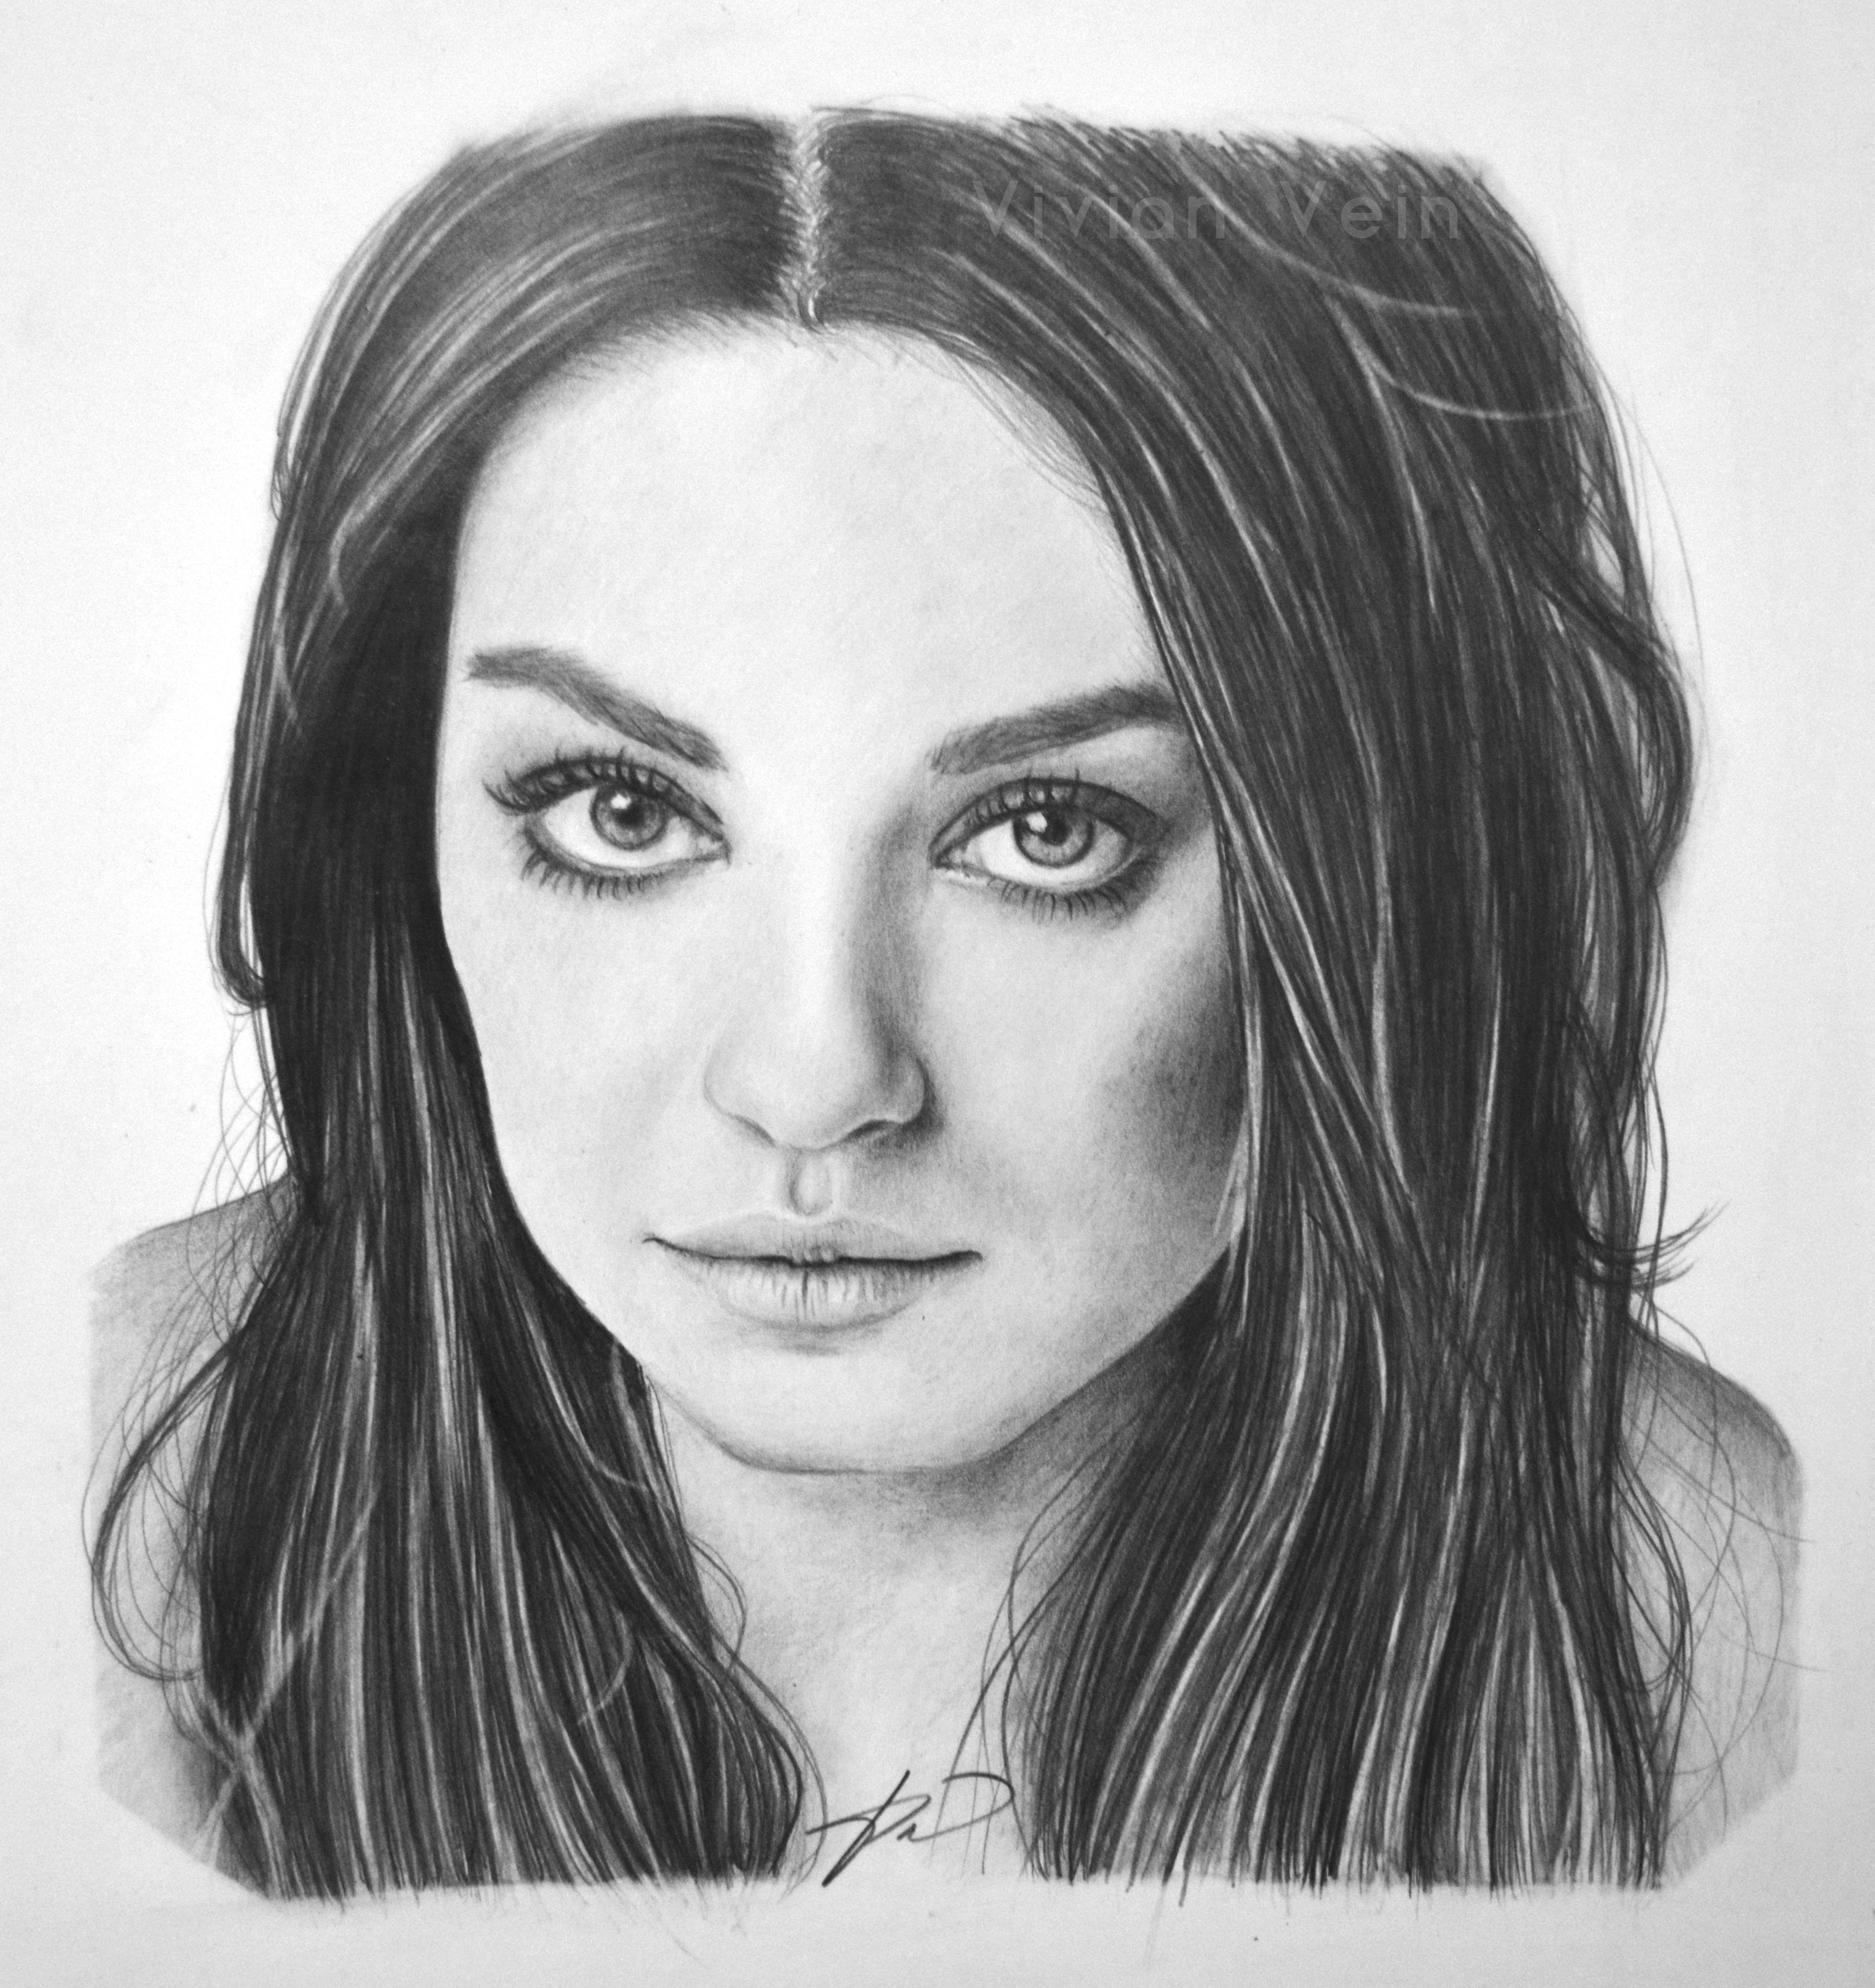 Mila kunis original pencil drawing actress fine art home decor